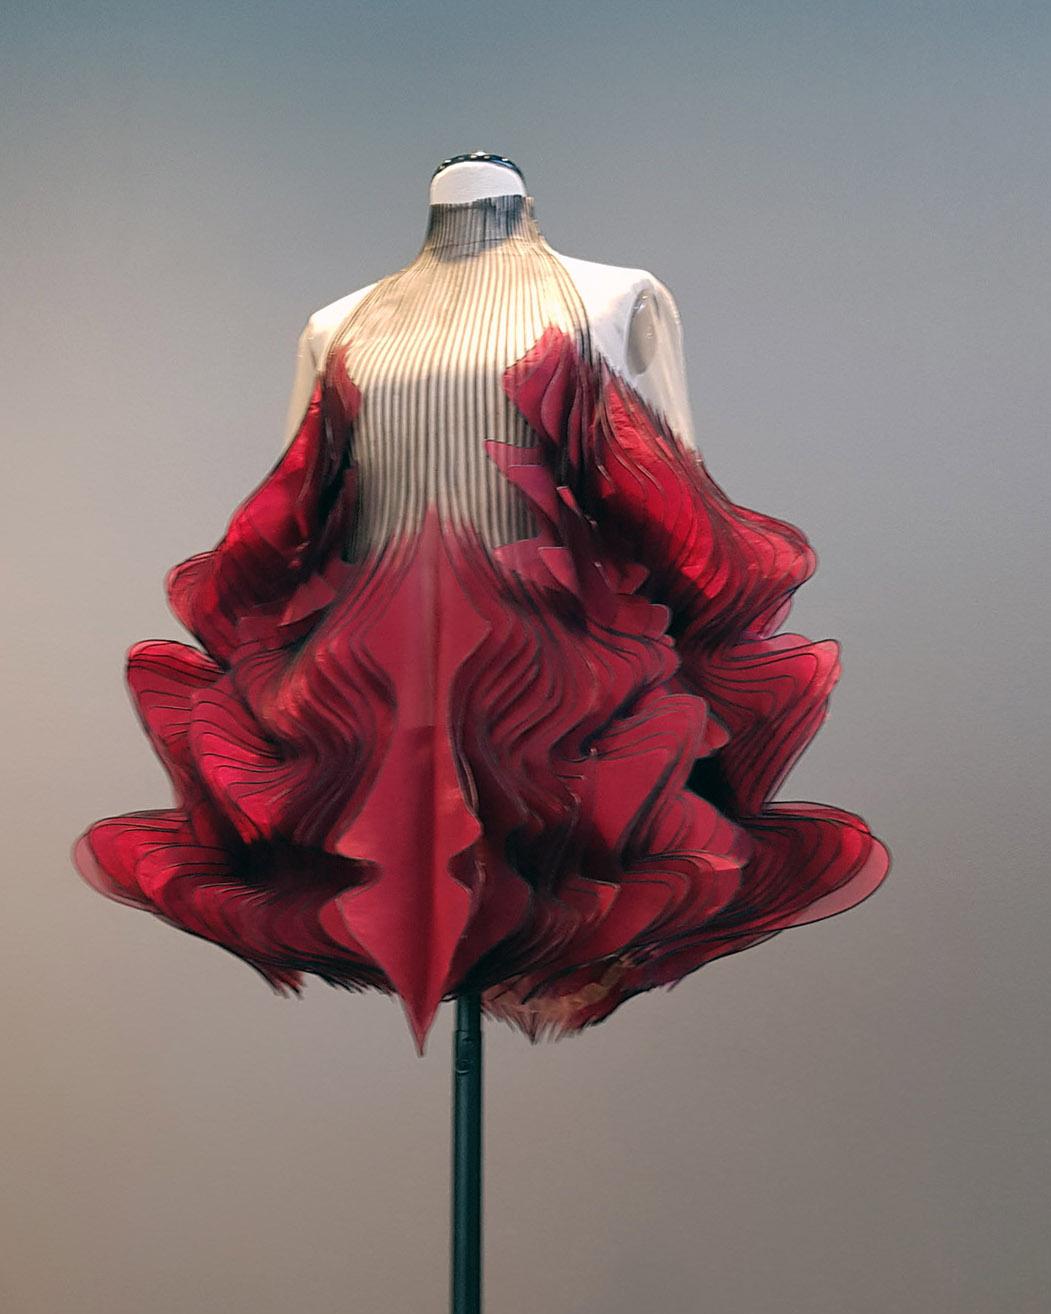 "Wystawa Iris van Herpen ""Alchemic couture"", Stary Browar, Poznań"